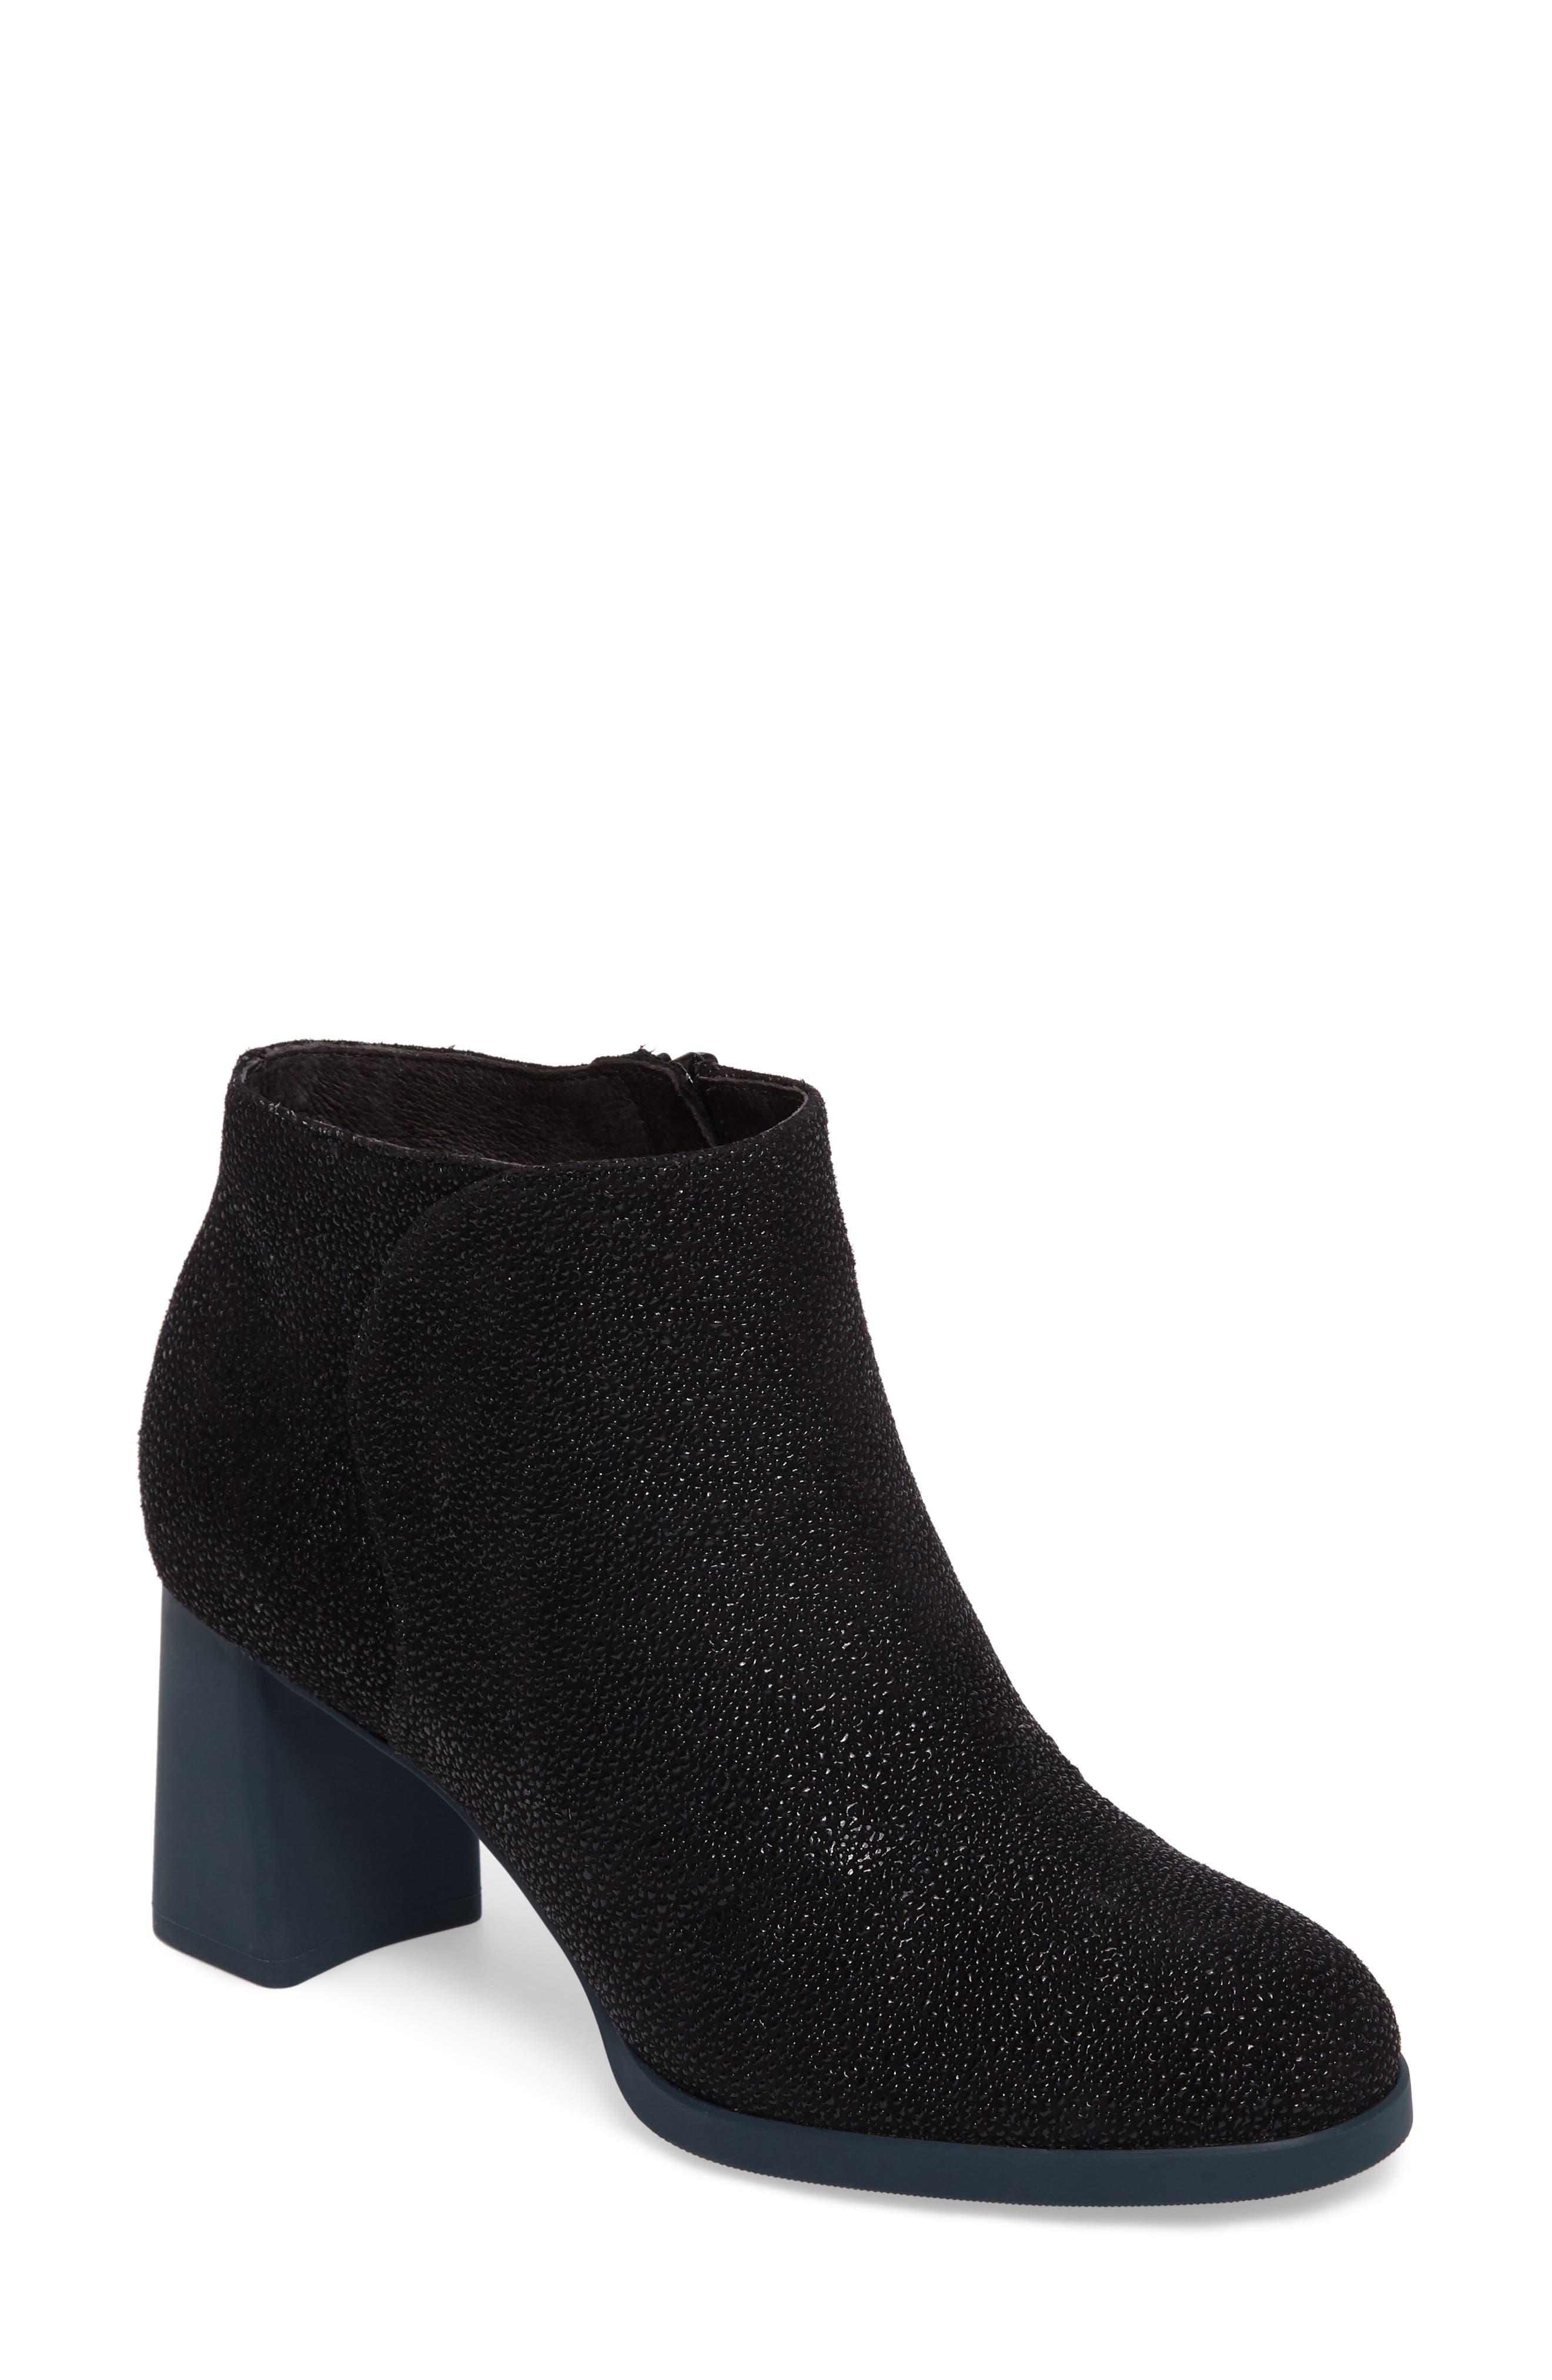 Kara Flared Heel Bootie,                             Main thumbnail 1, color,                             Black Sparkle Leather